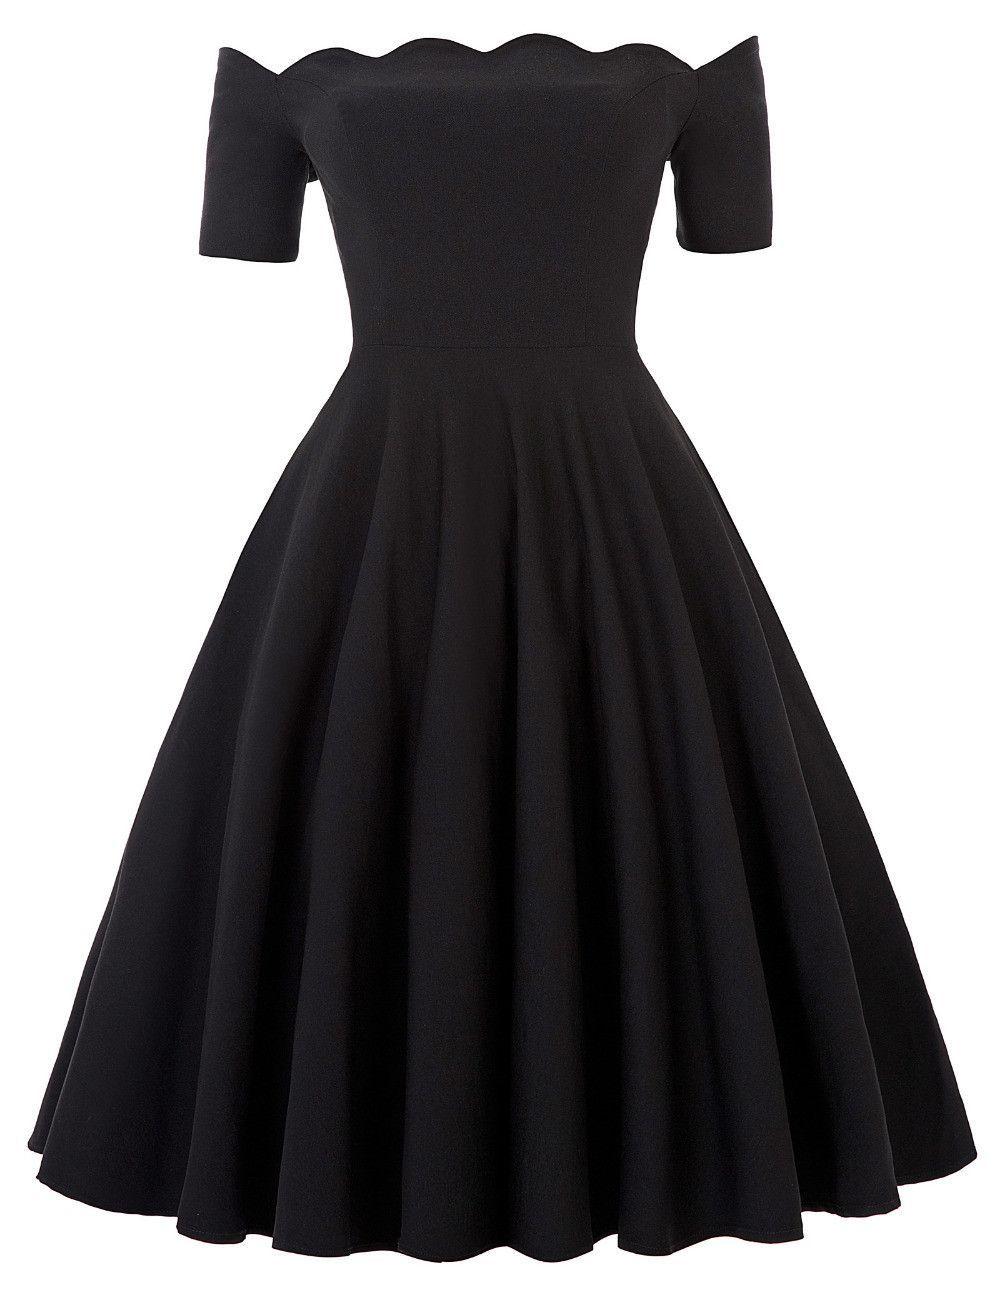 Off shoulder dress audrey hepburn vestidos vintage s s